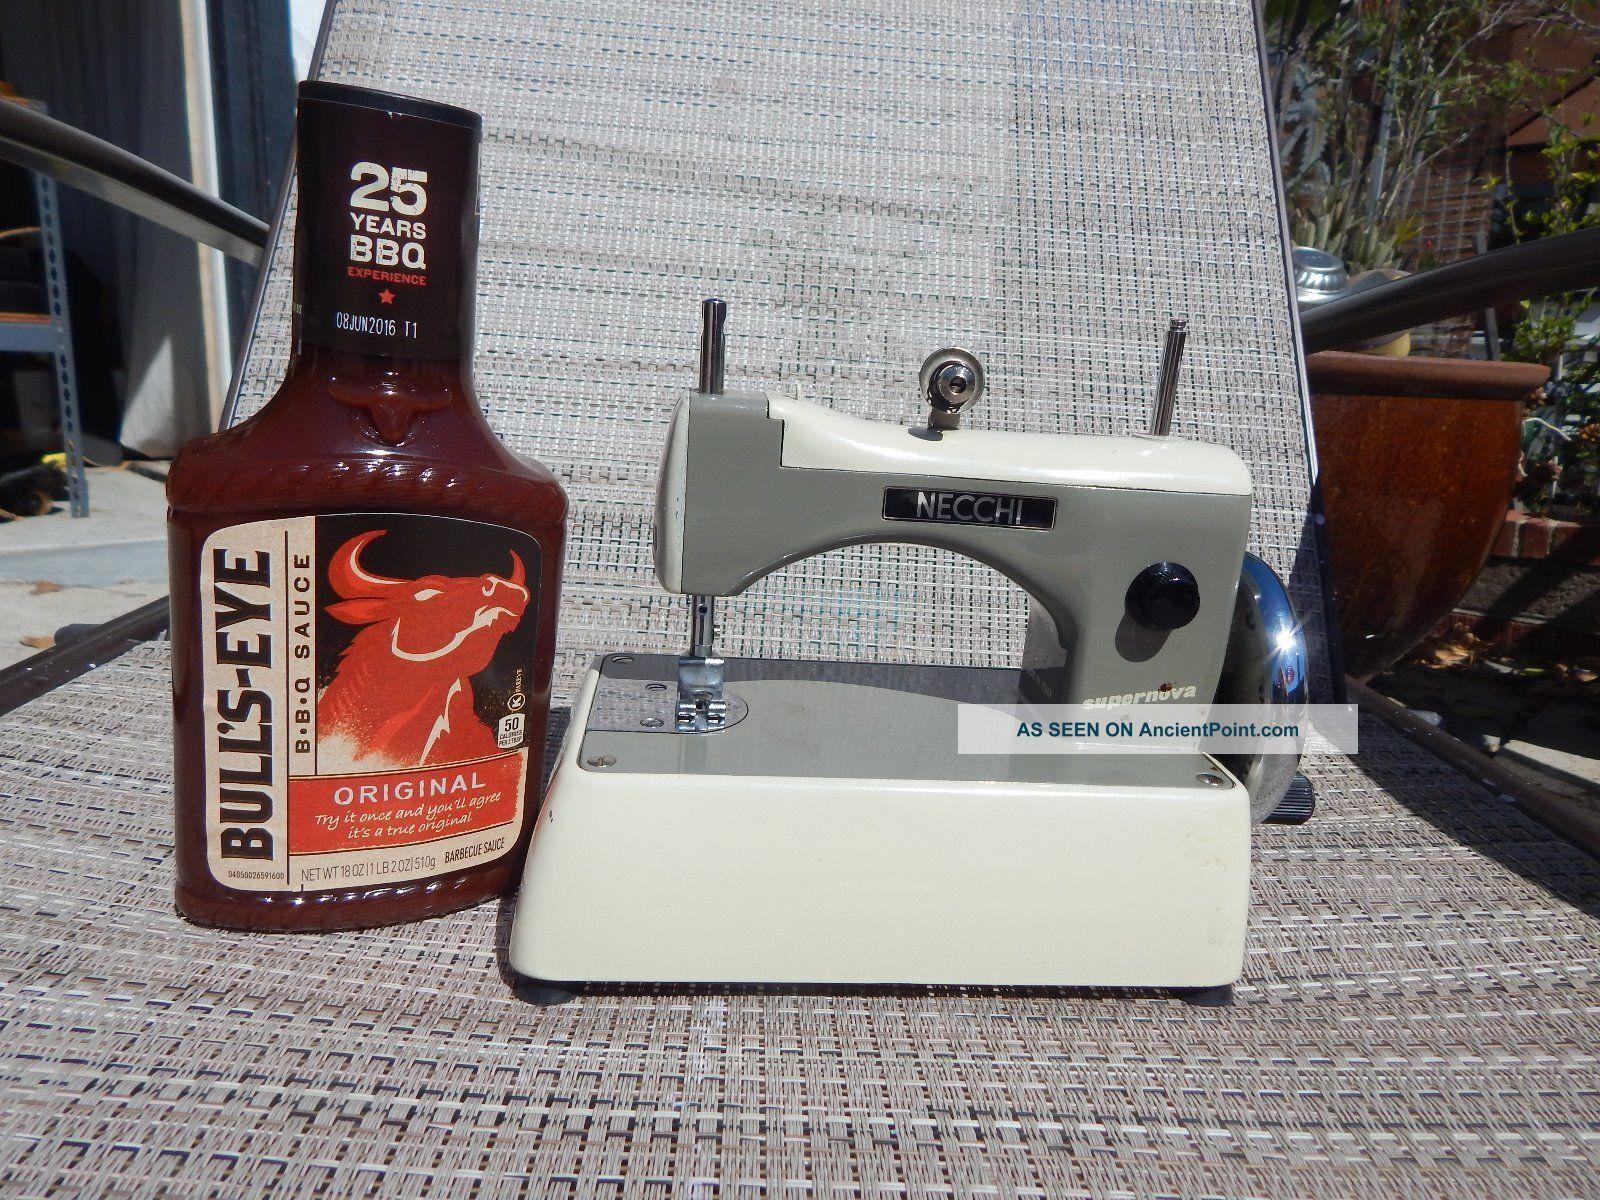 Vintage Necchi Supernova Italy Tiny Hand Crank Sewing Machine W/case Sewing Machines photo